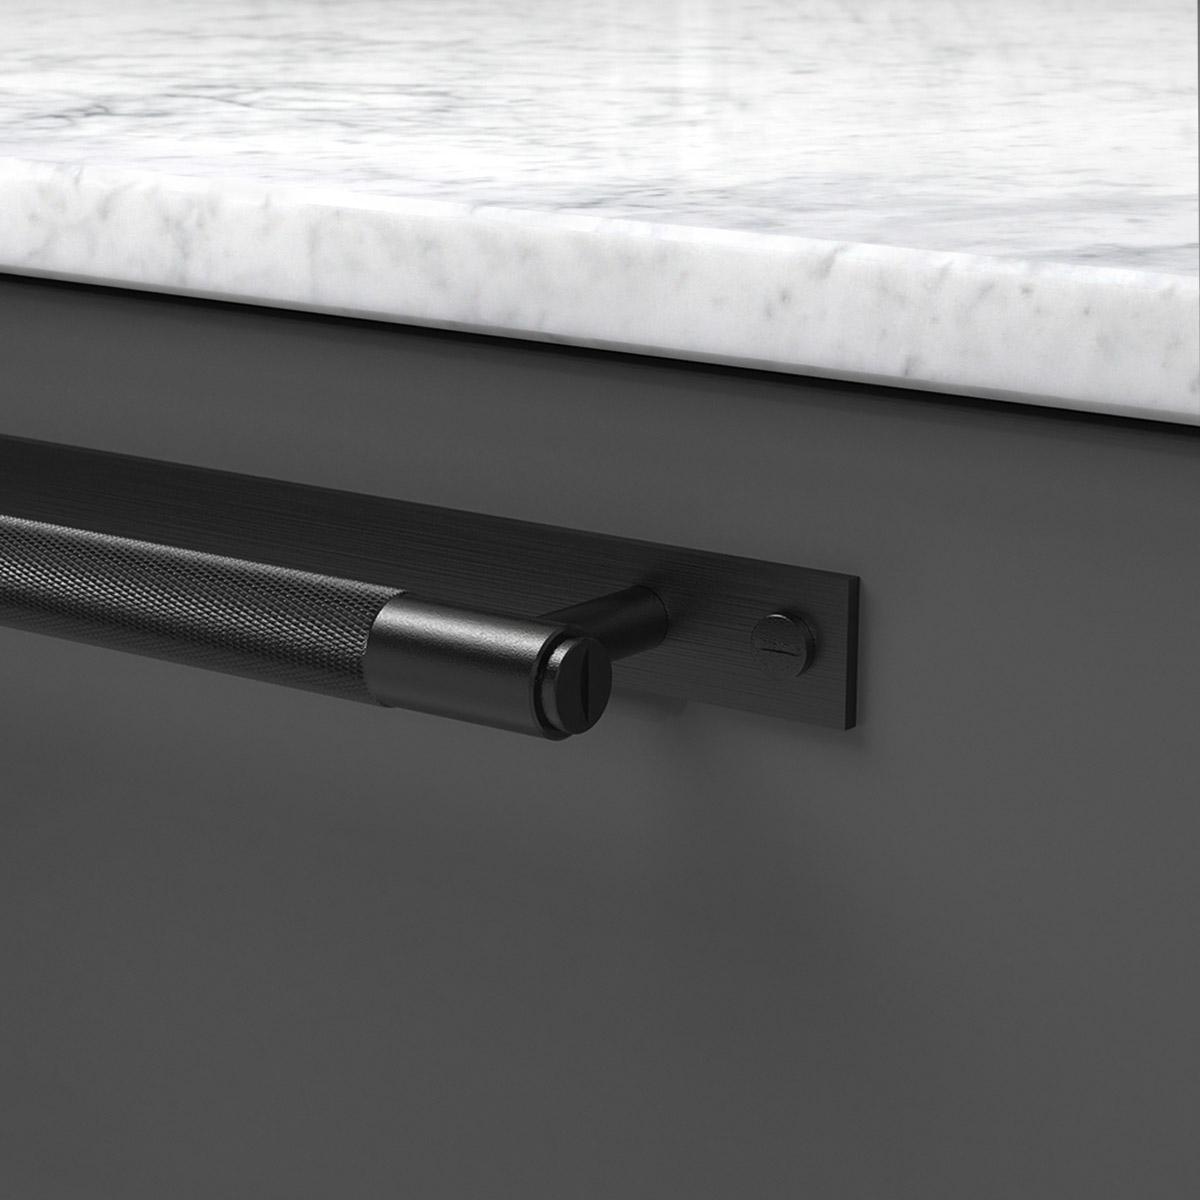 pull bar plate svart uk pb hp 260 bl a cc 225 mm ncs s 7500 n marmor carrara detalj